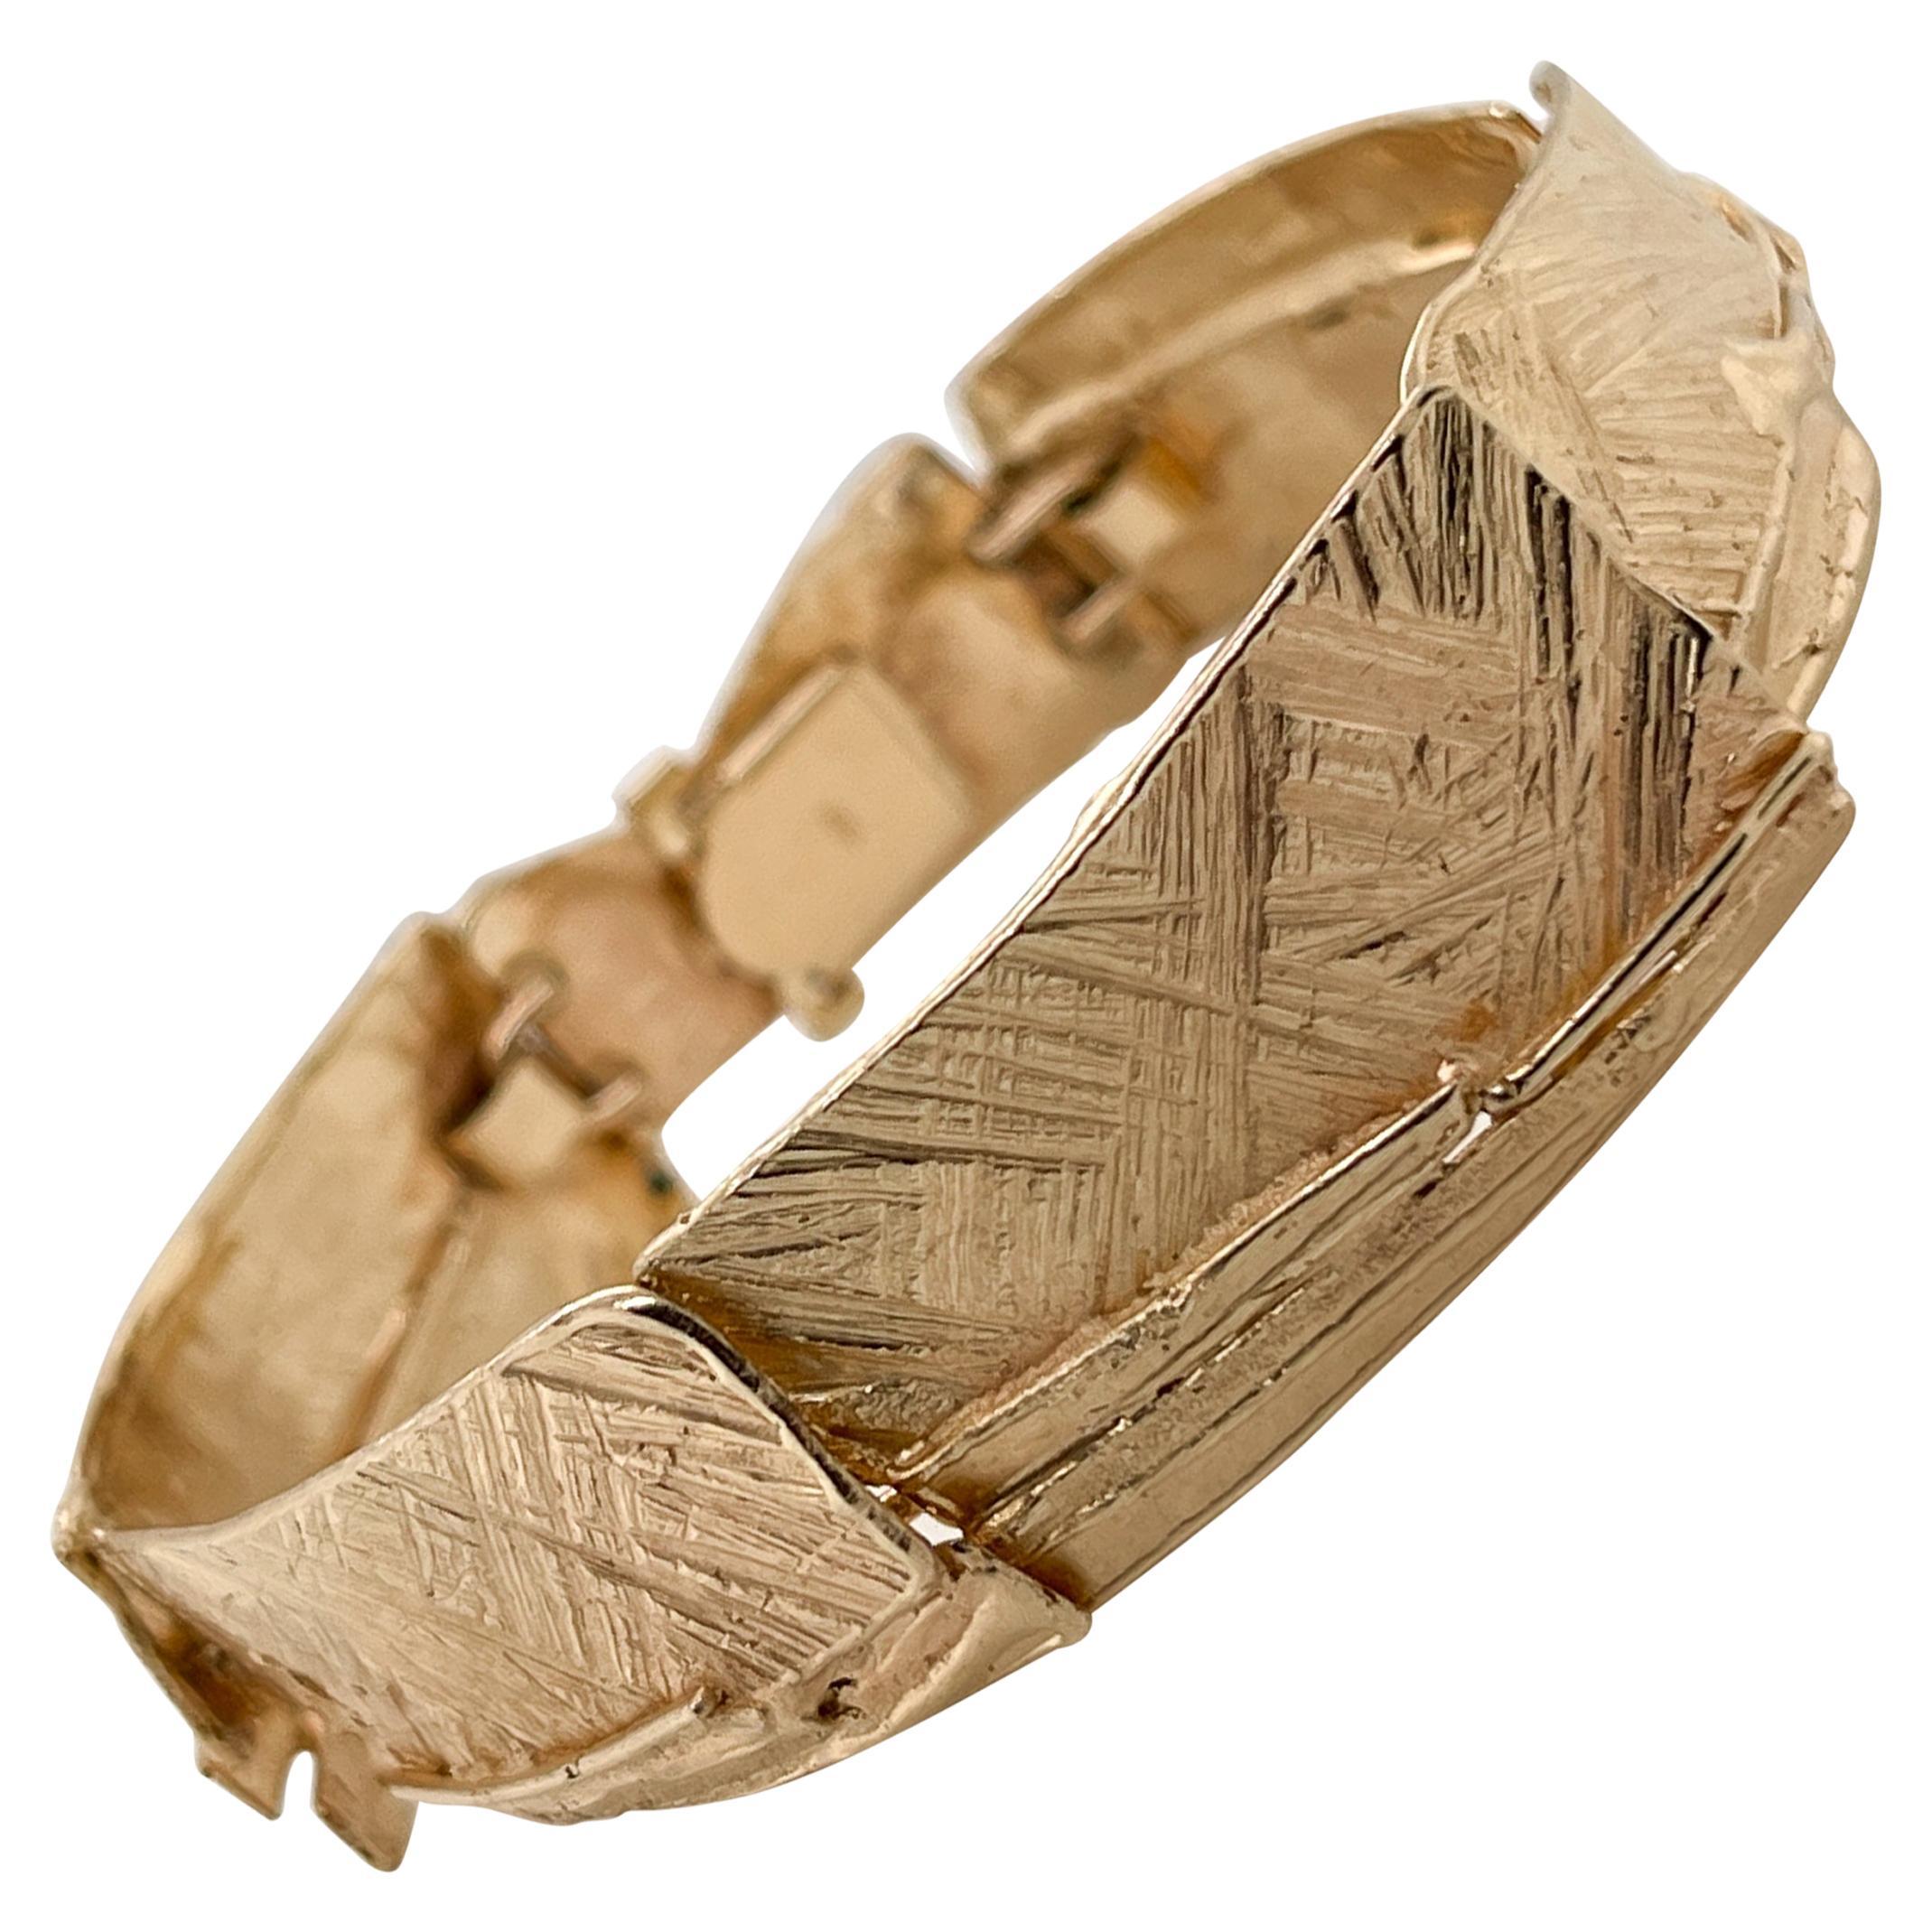 Modernist 14k Gold Link Bracelet Attributed to Glenda Arentzen, Ex-Aaron Faber